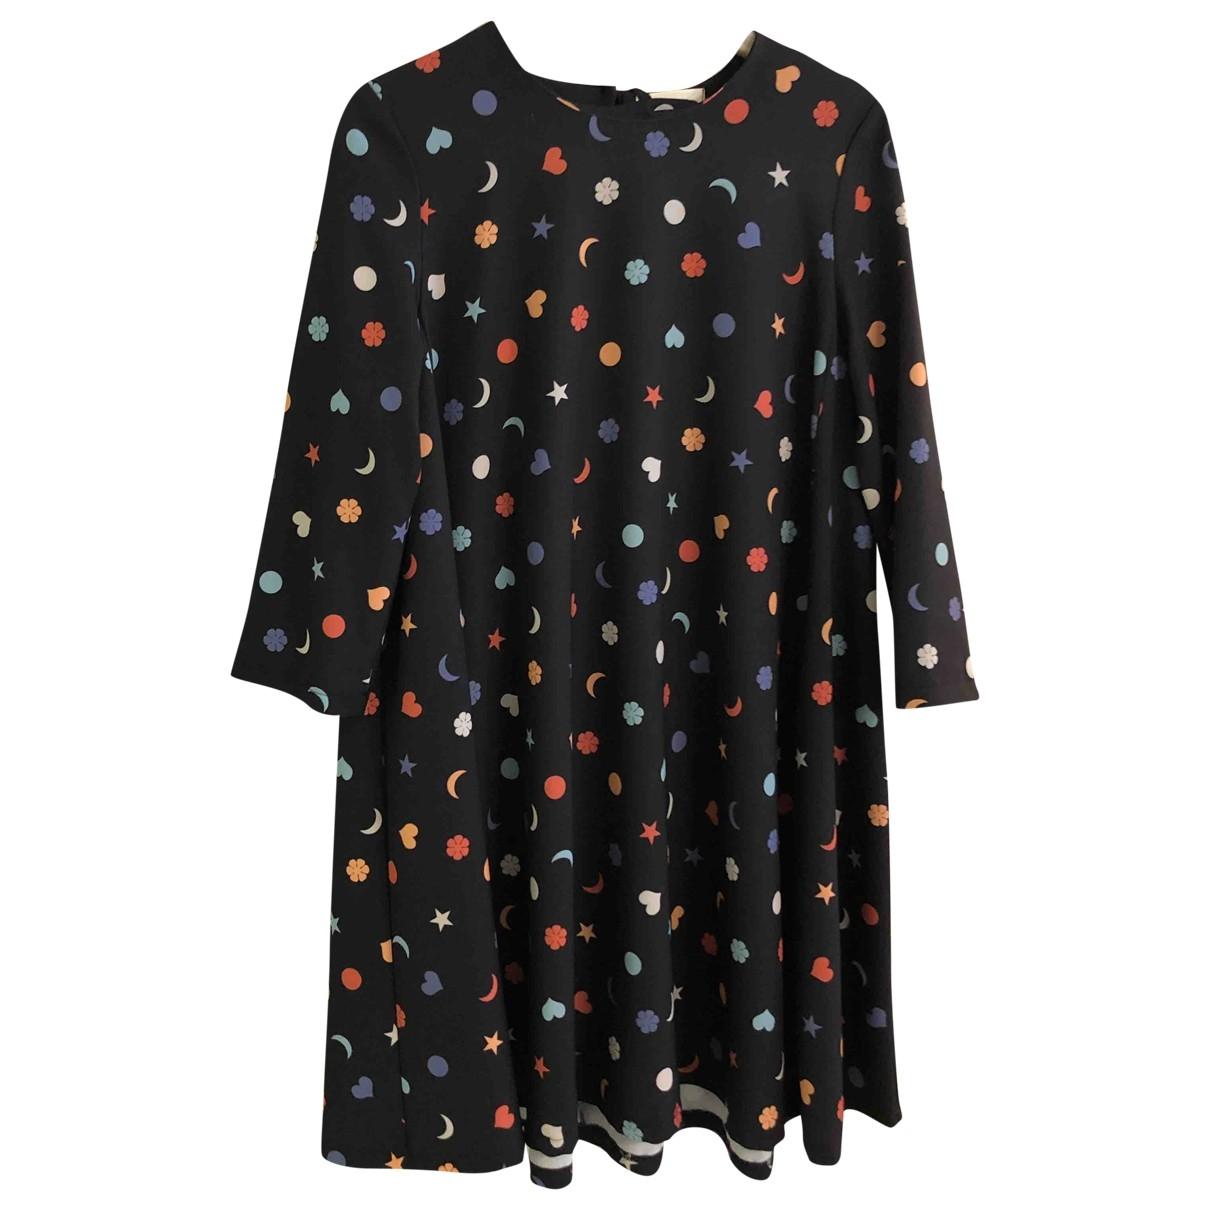 Vicolo \N Black dress for Women M International